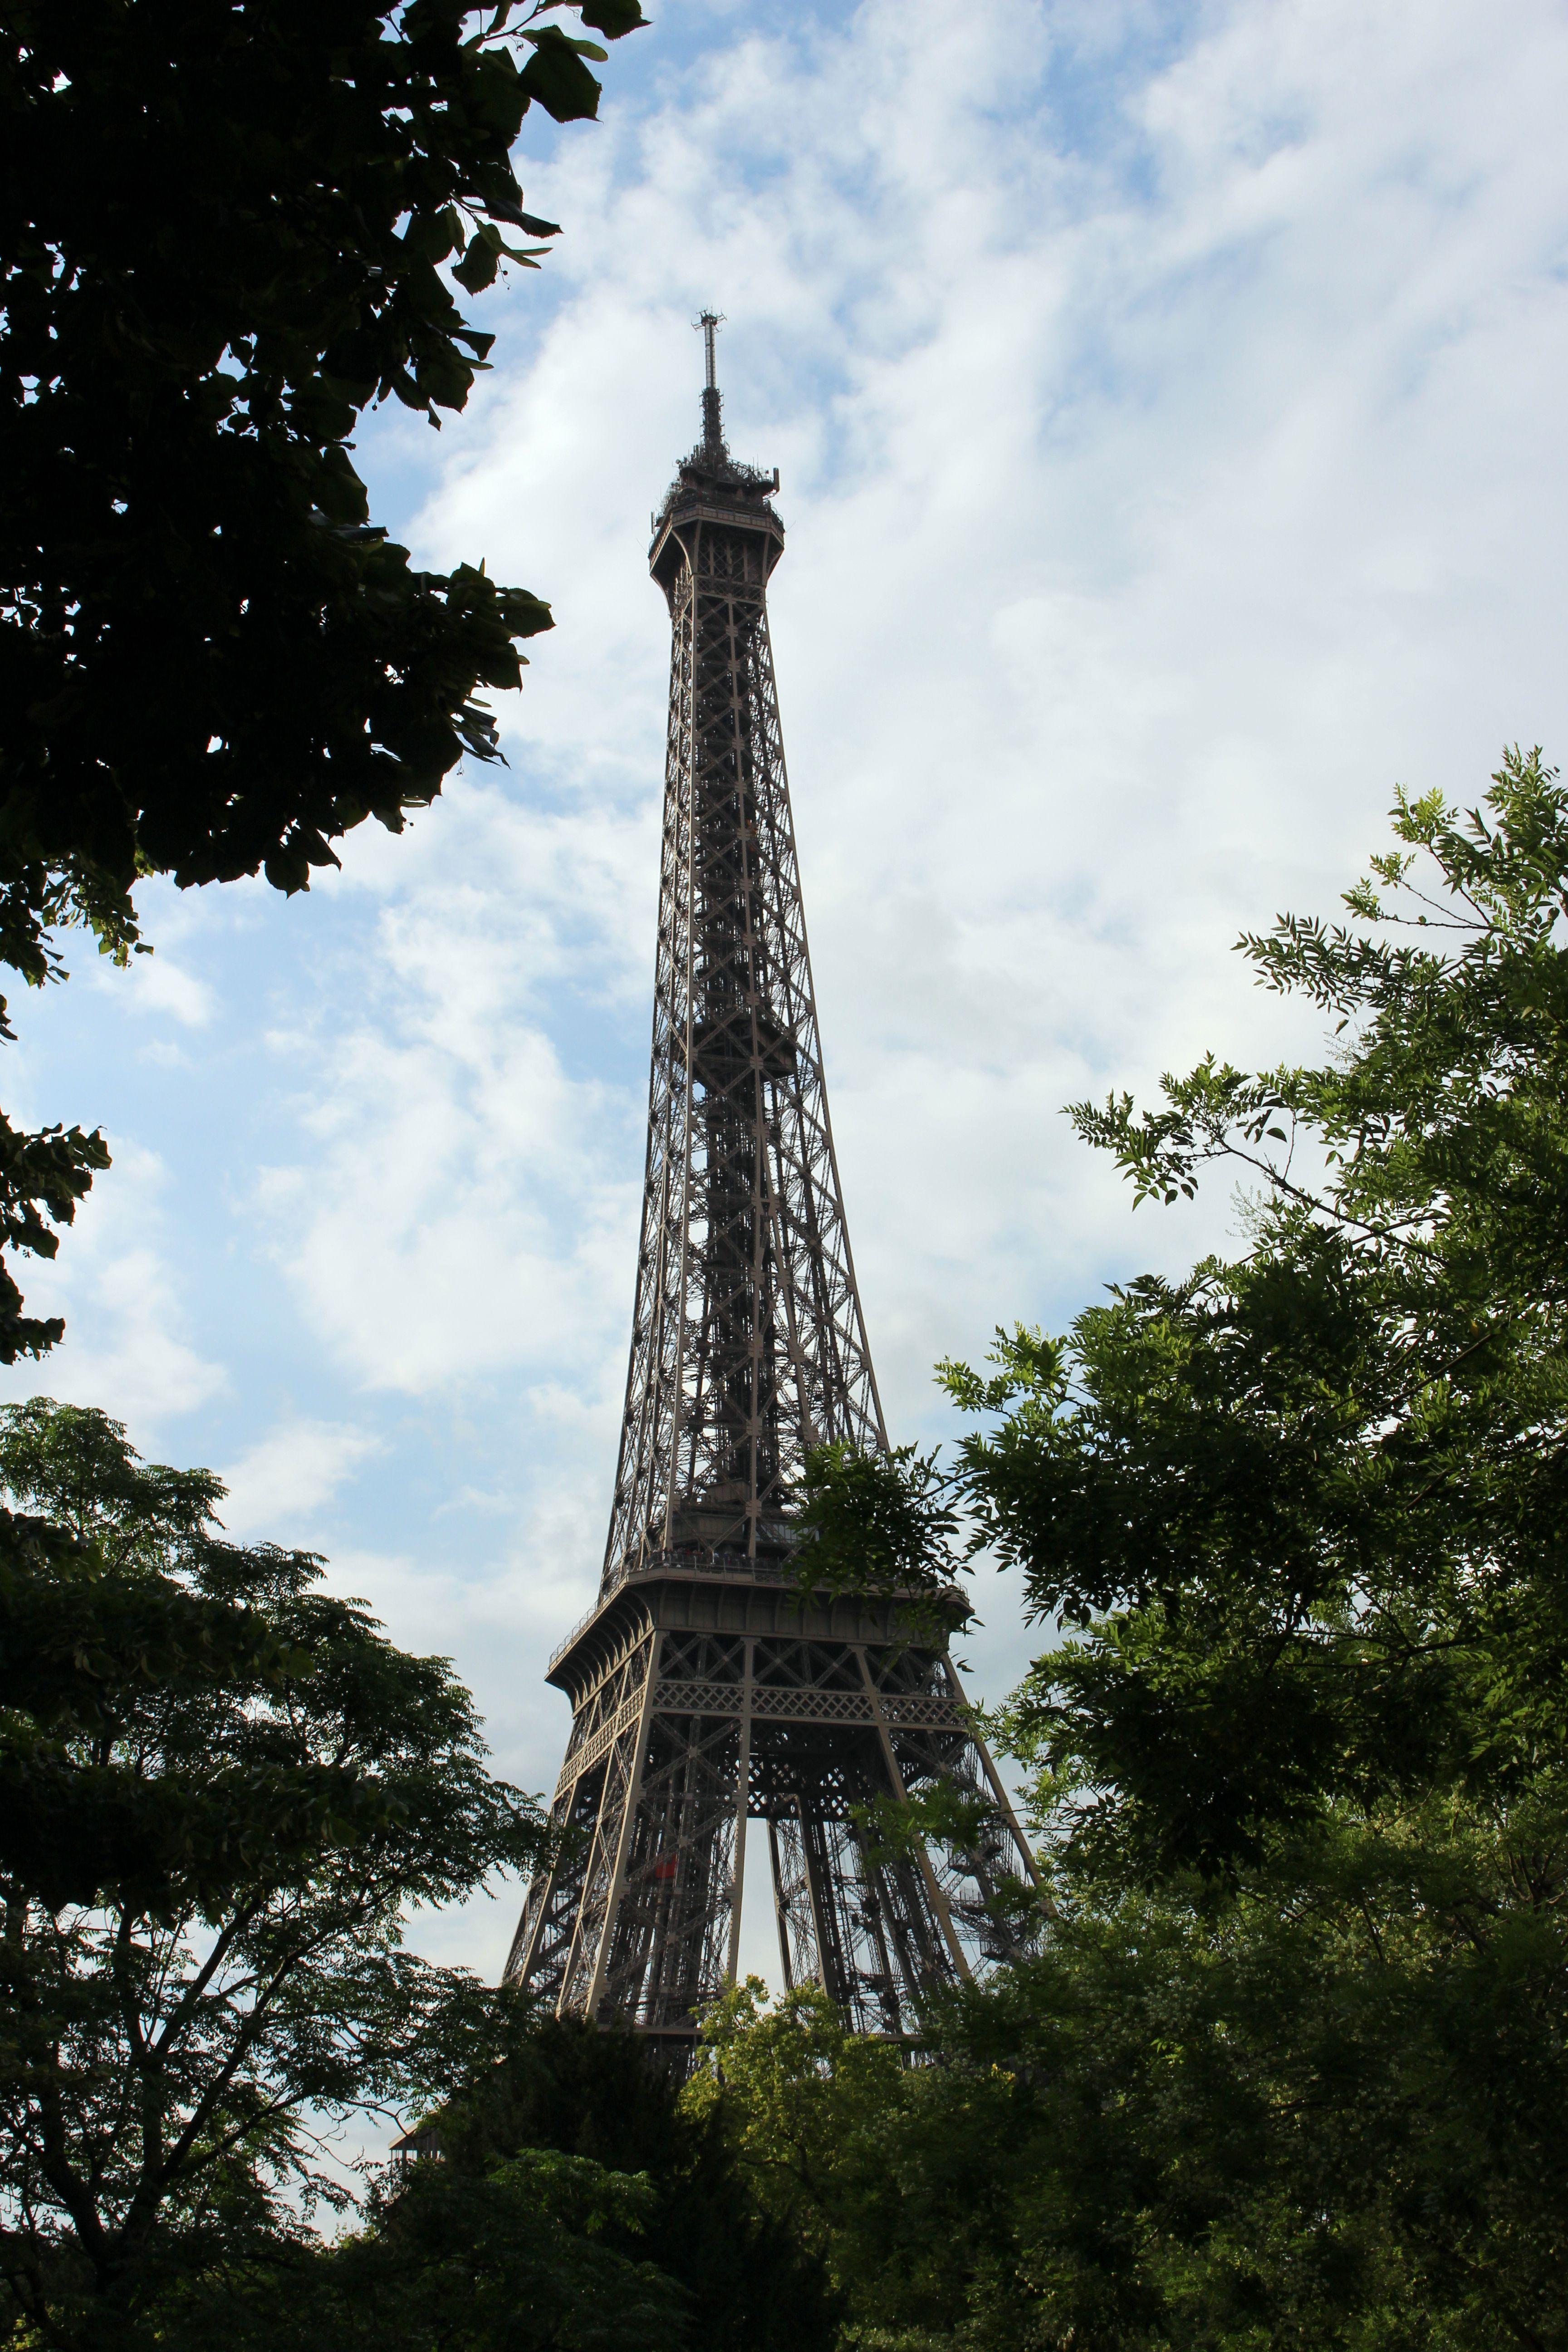 Eiffel Tower | Paris architecture, Eiffel tower, Beautiful ...